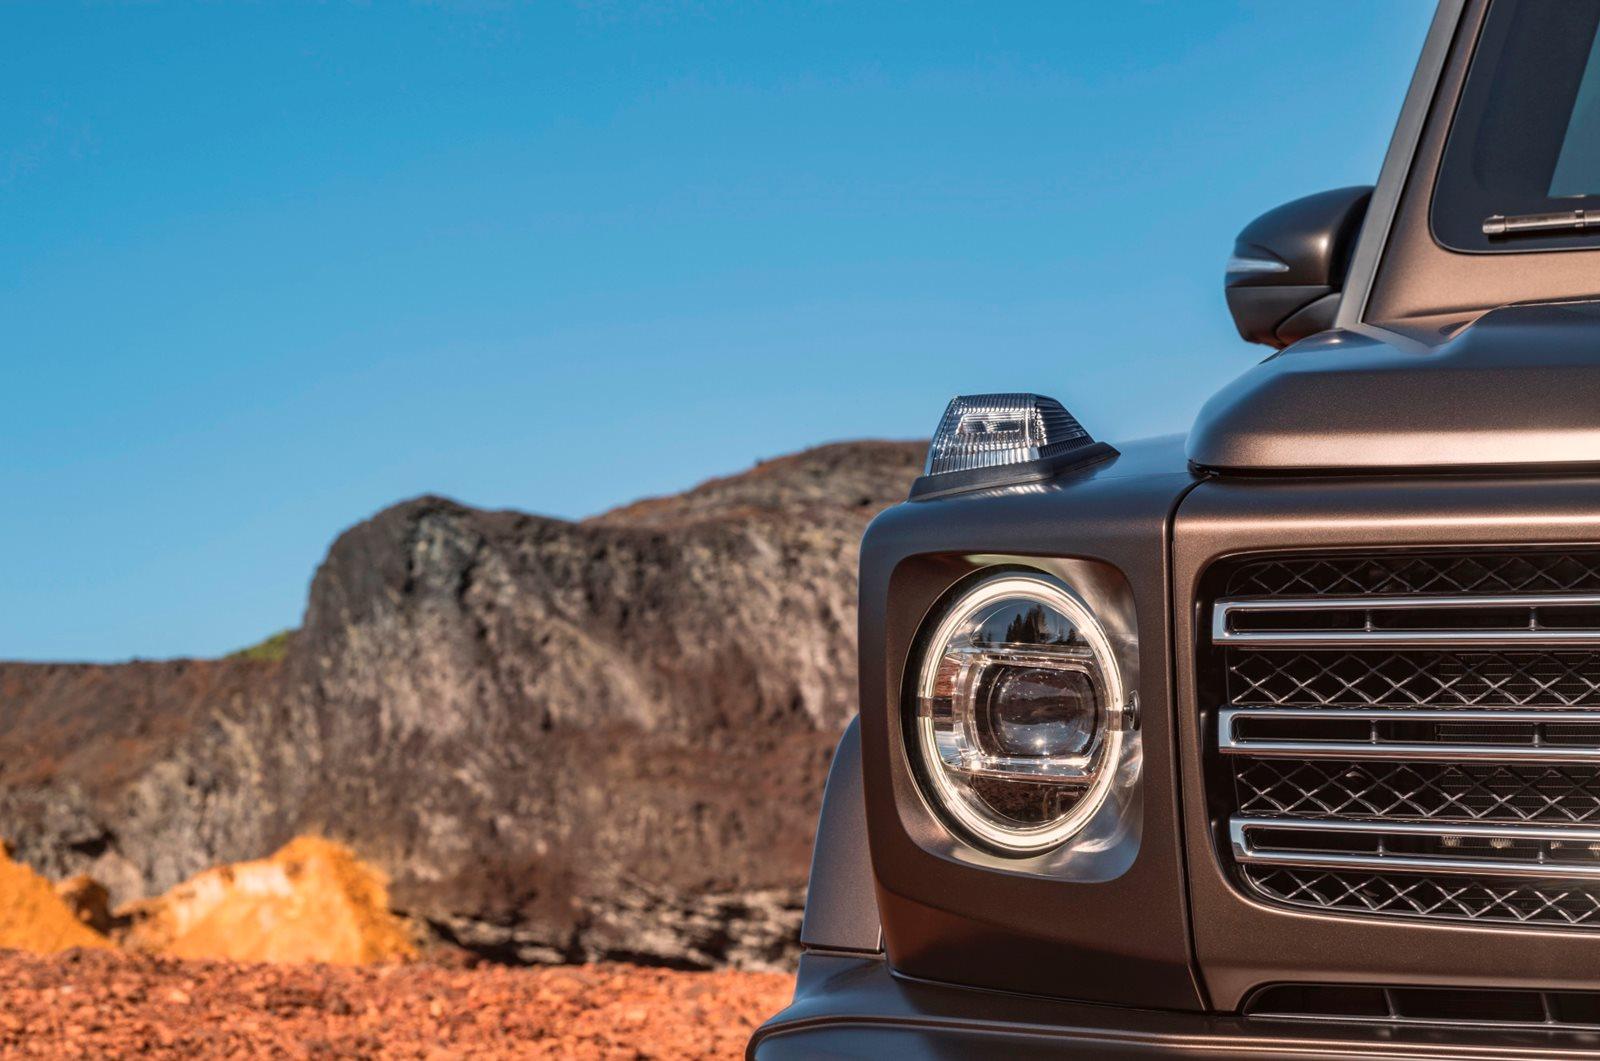 Mercedes G-Class Round LED Headlights